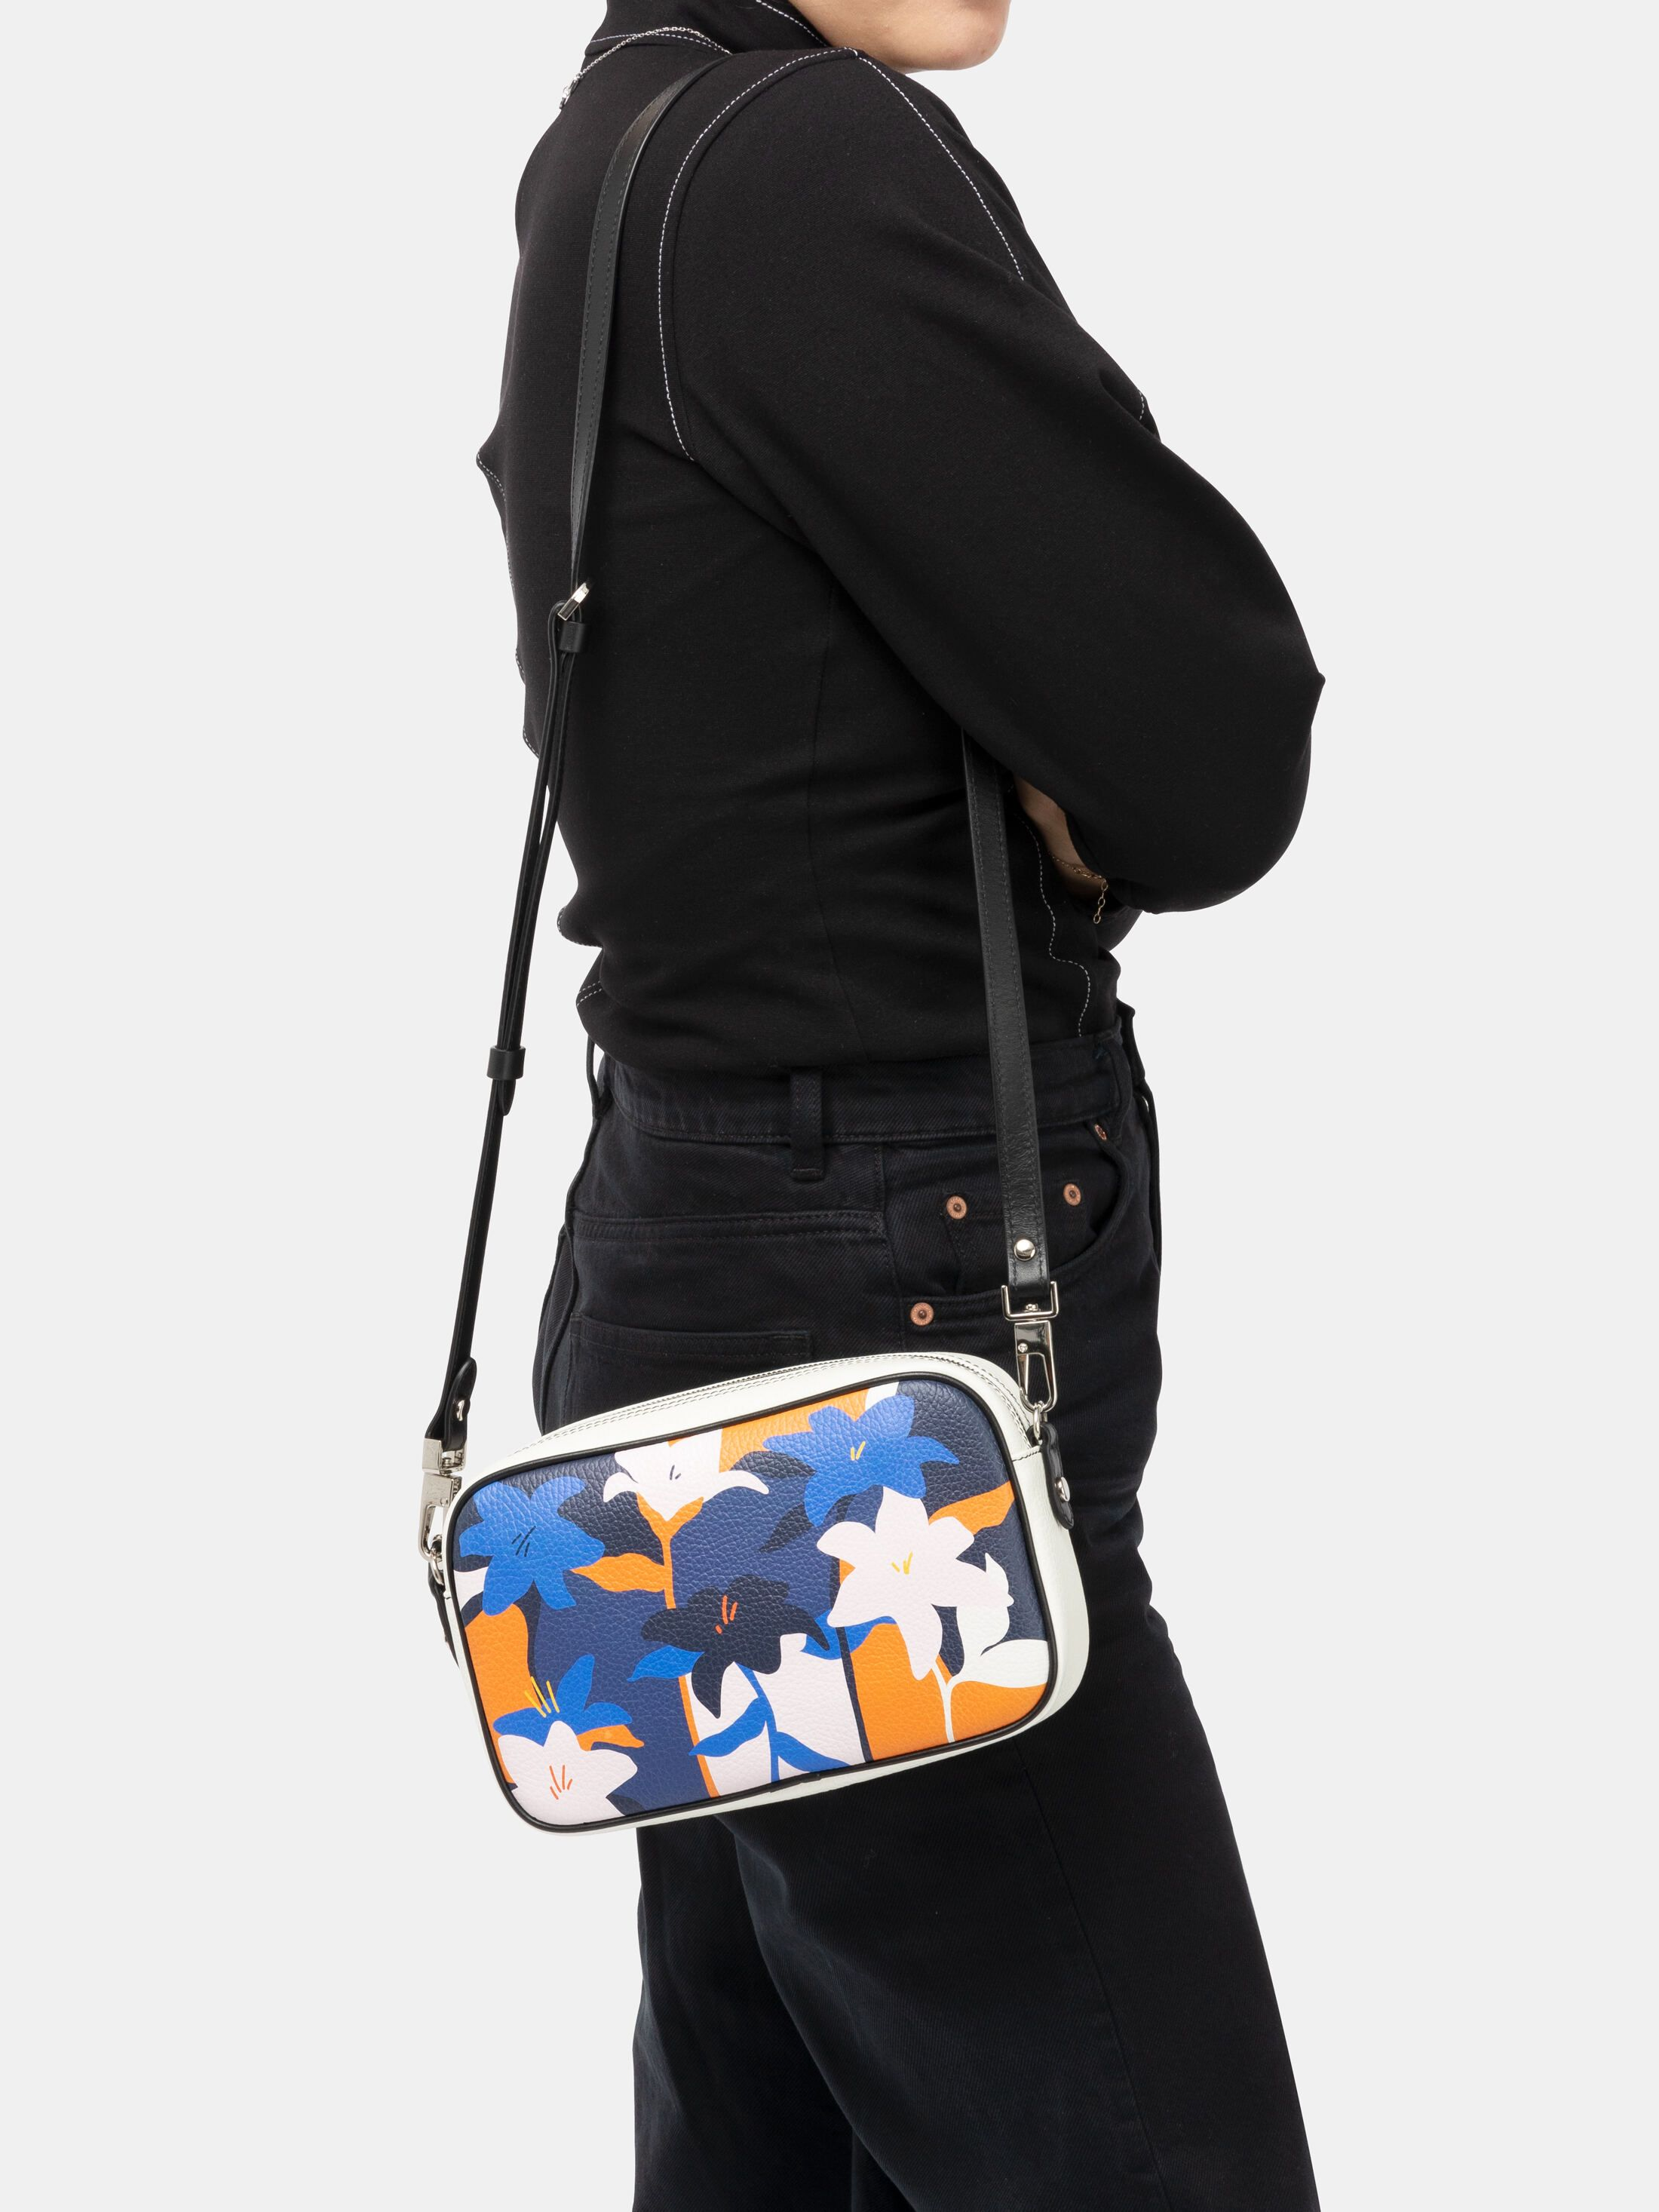 bolso compacto personalizado